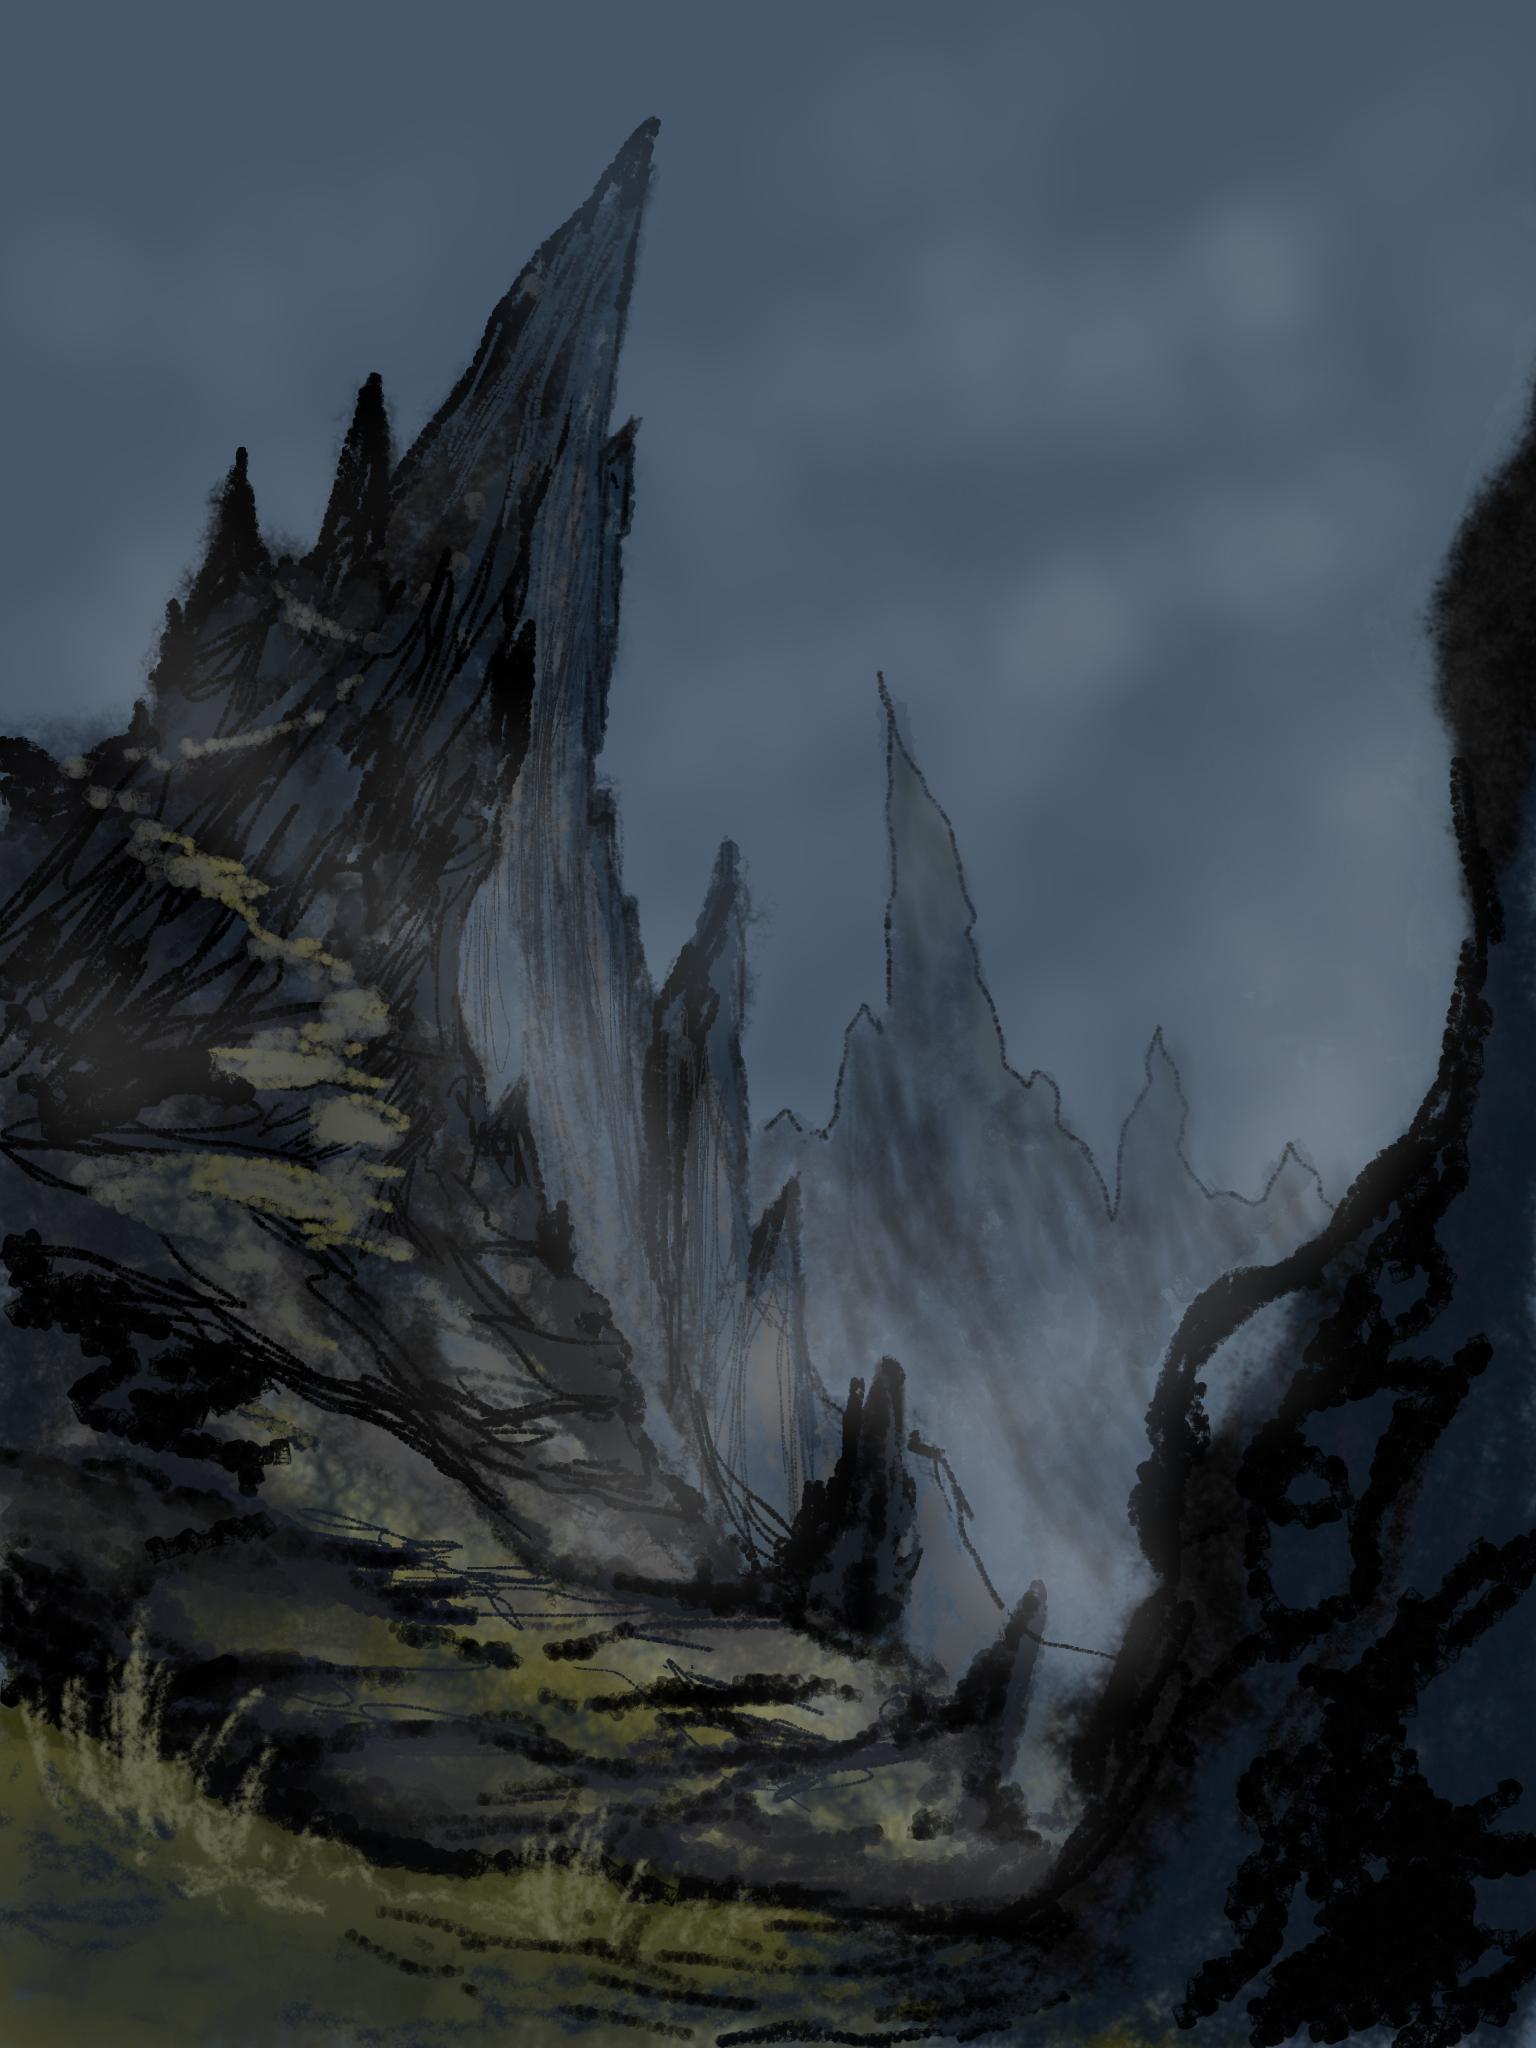 http://orig13.deviantart.net/b772/f/2014/204/f/c/dark_canyon_by_alrine-d7s0pxw.jpg